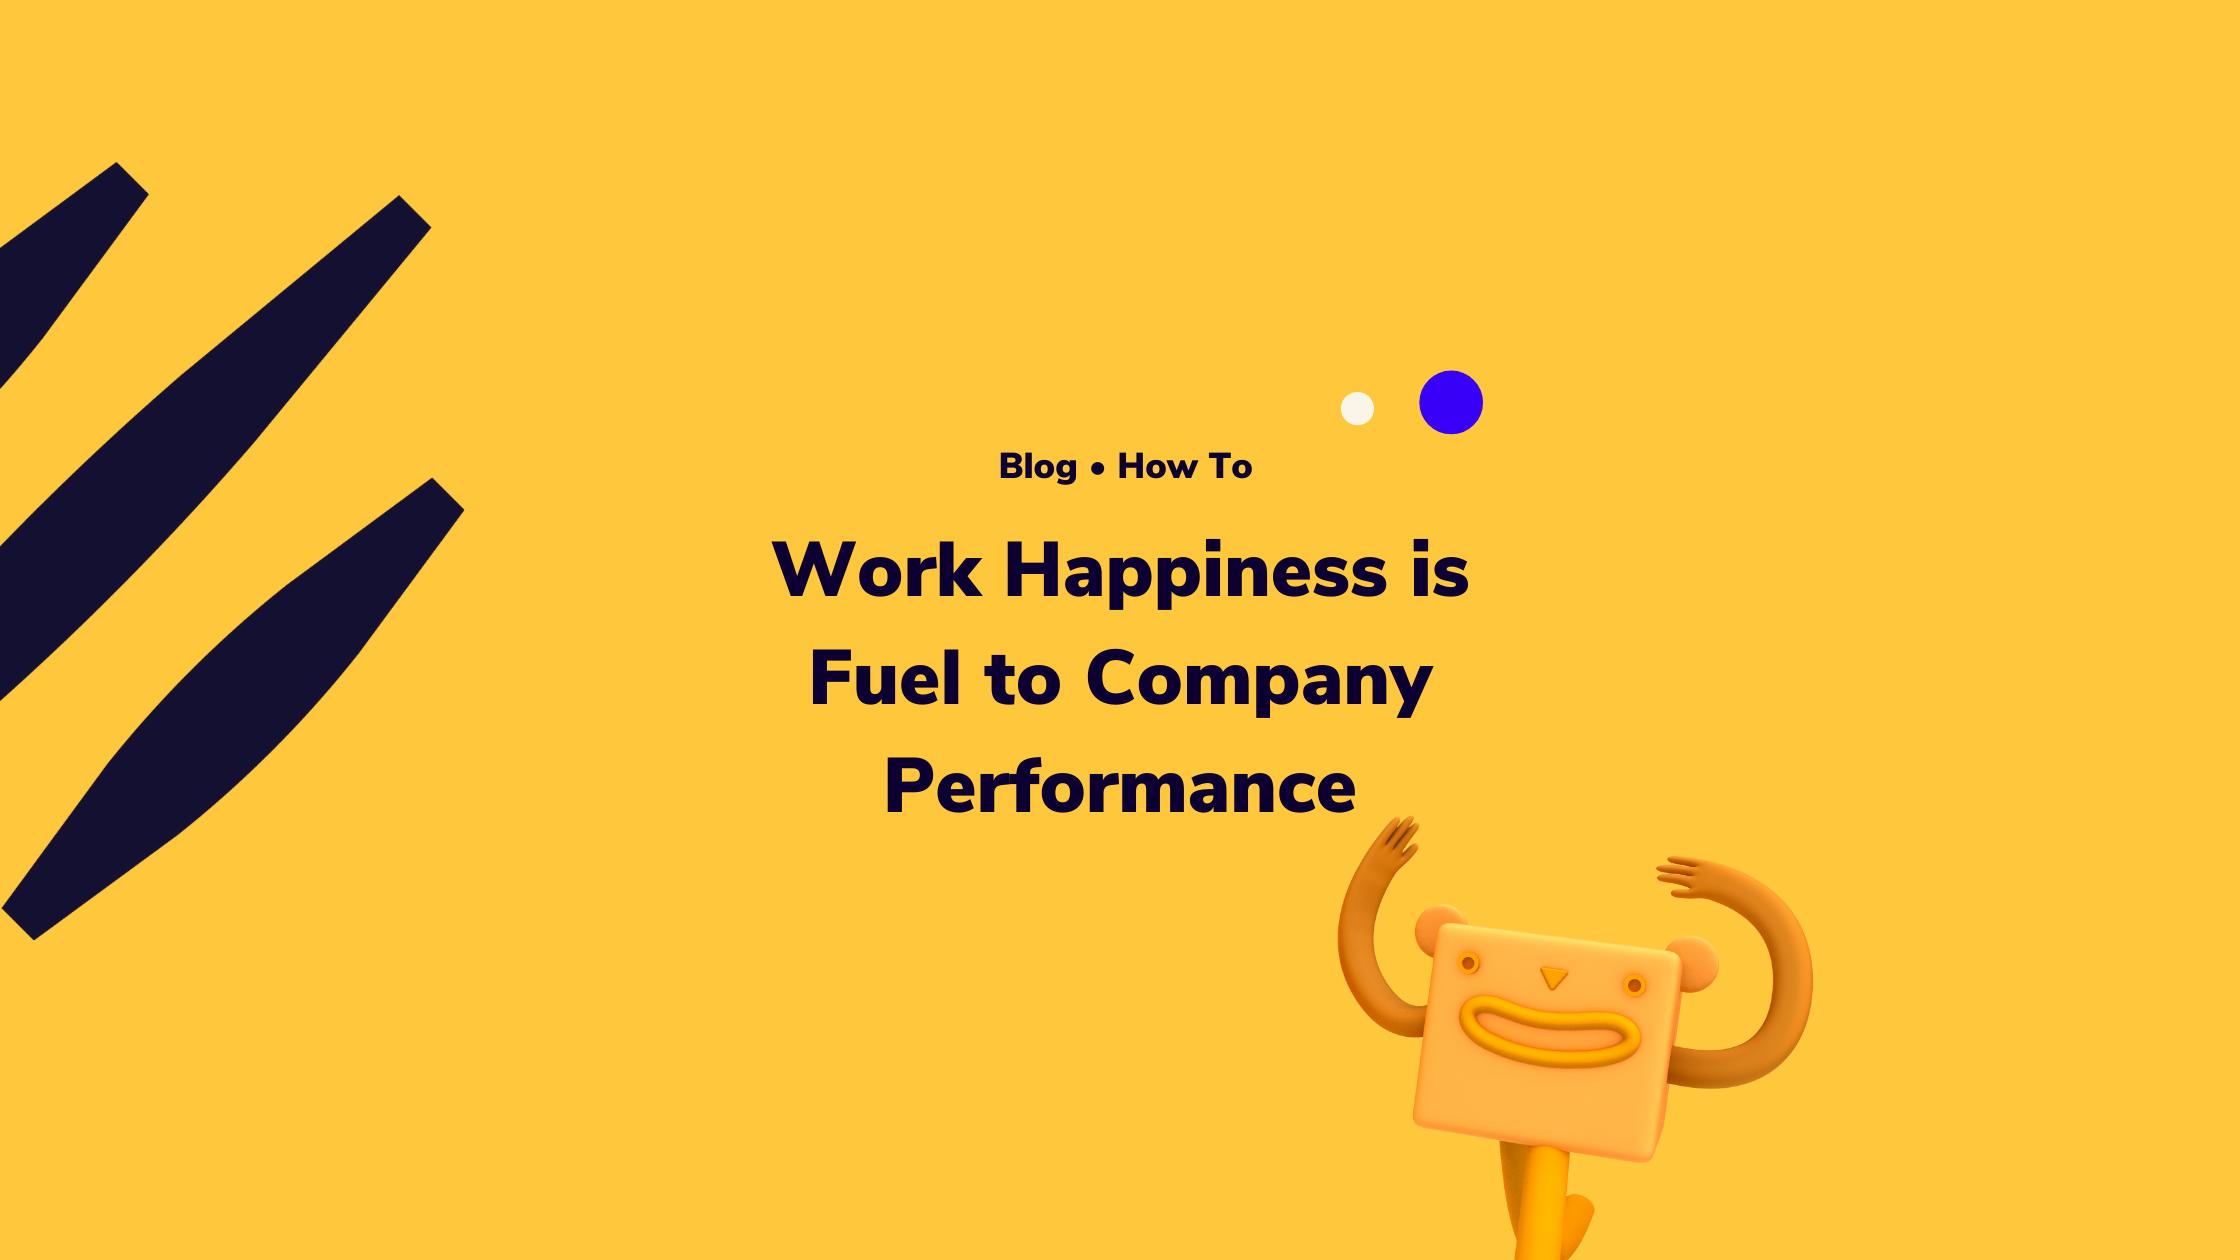 Employee happiness versus company performance